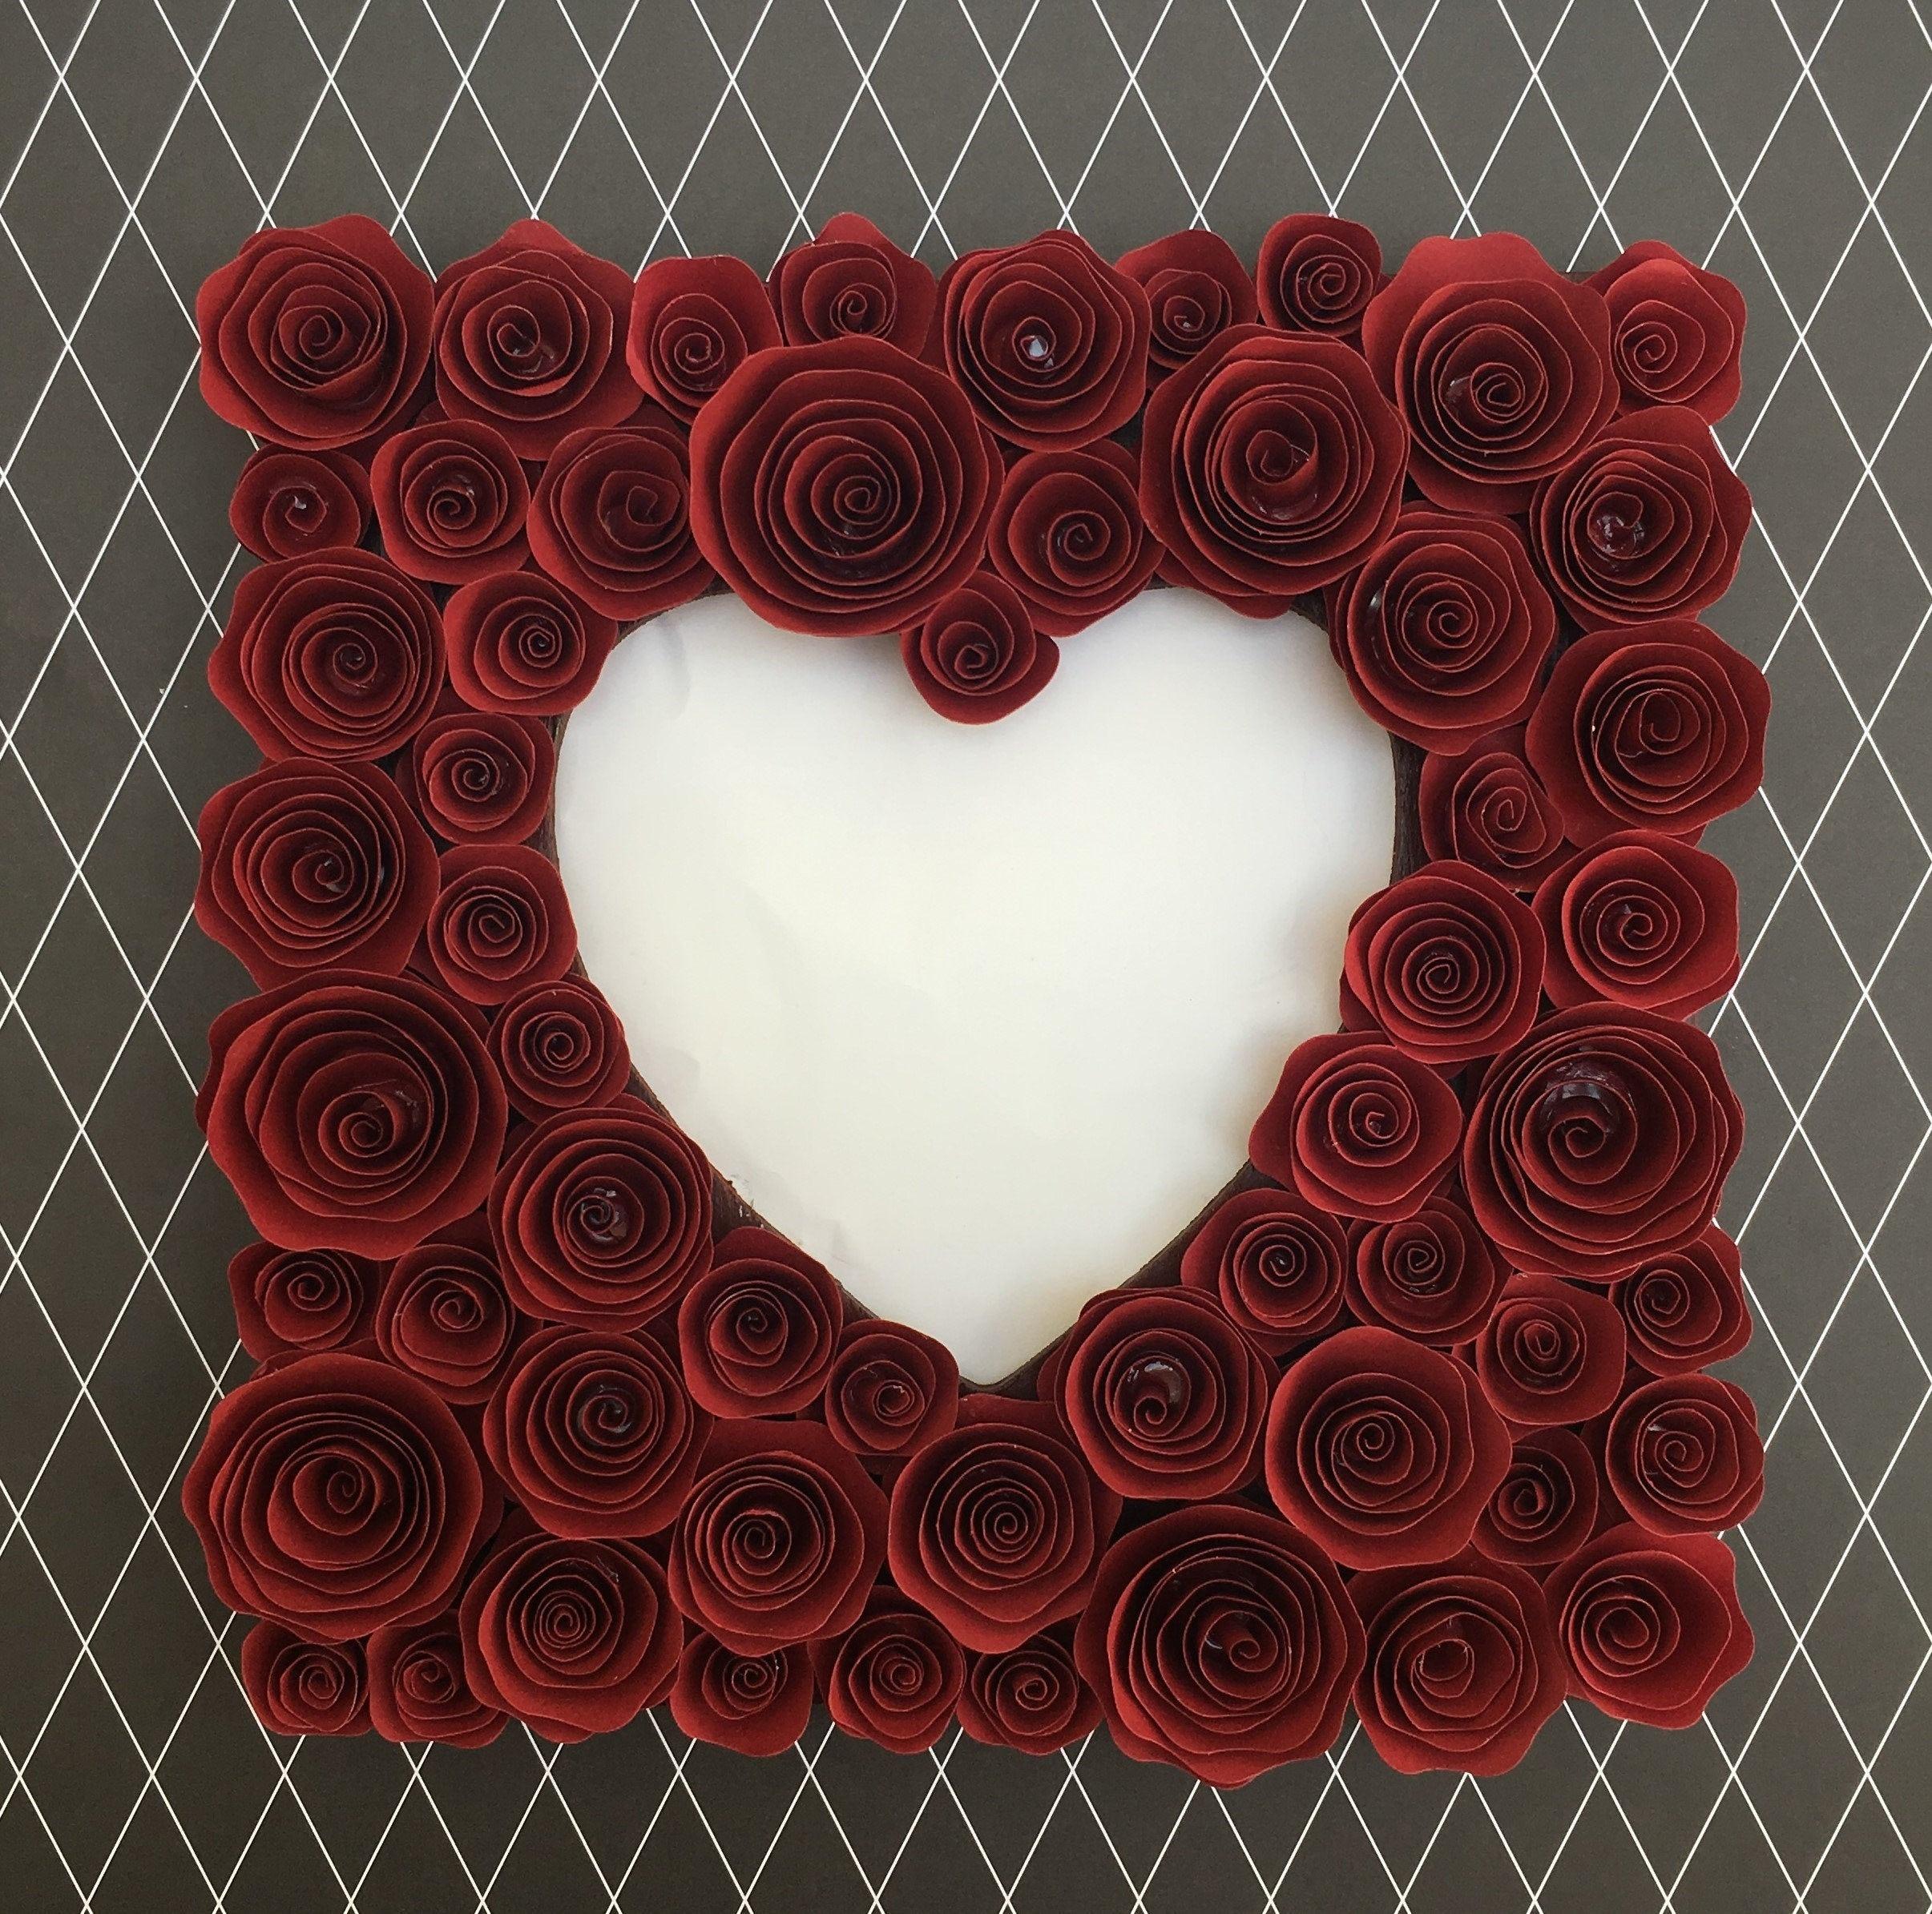 5 Senses Gift Ideas for Boyfriend